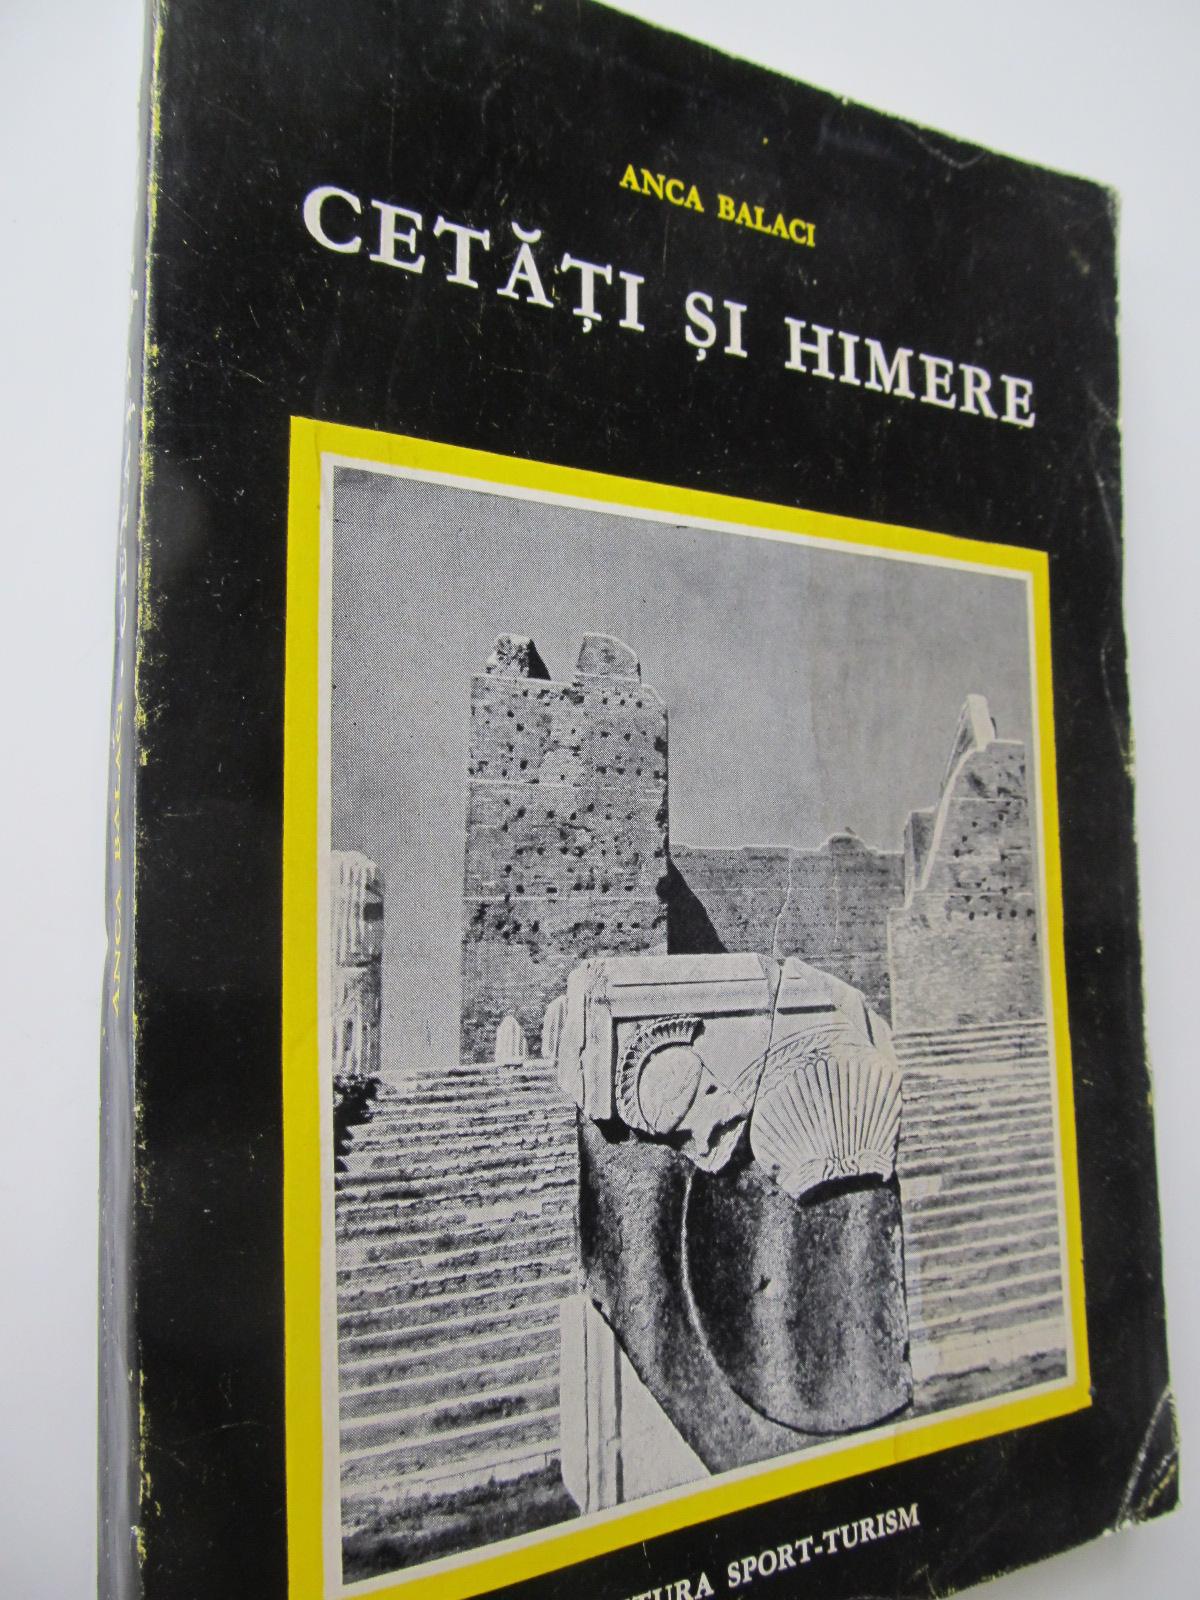 Cetati si himere - Italia de la Tarquinidia la Siracuza - Anca Balaci | Detalii carte